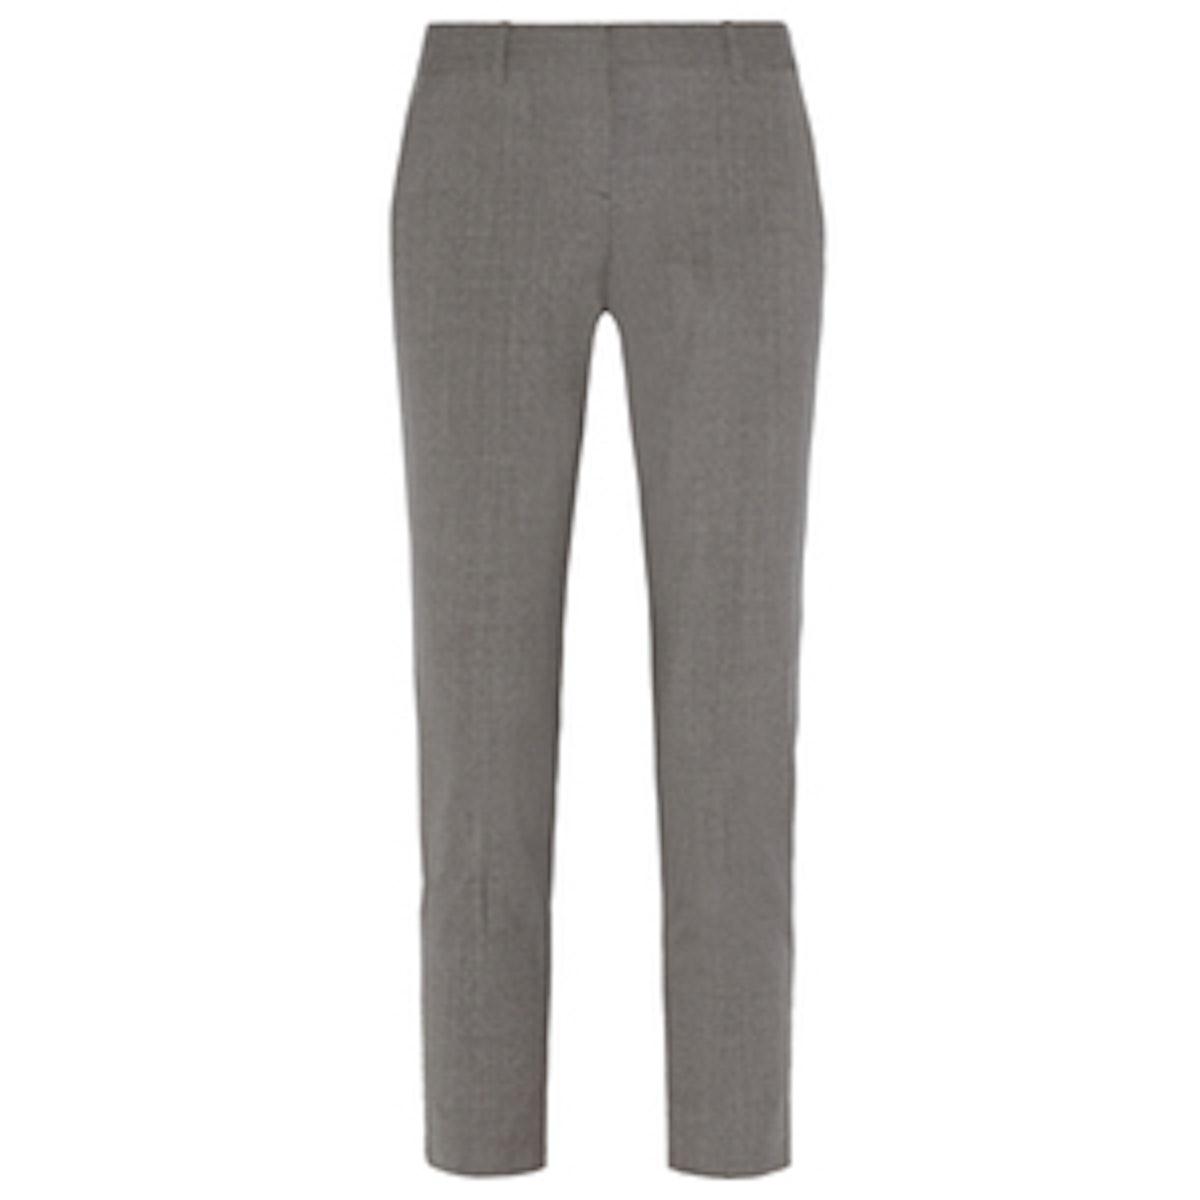 Testra Straight Leg Pants